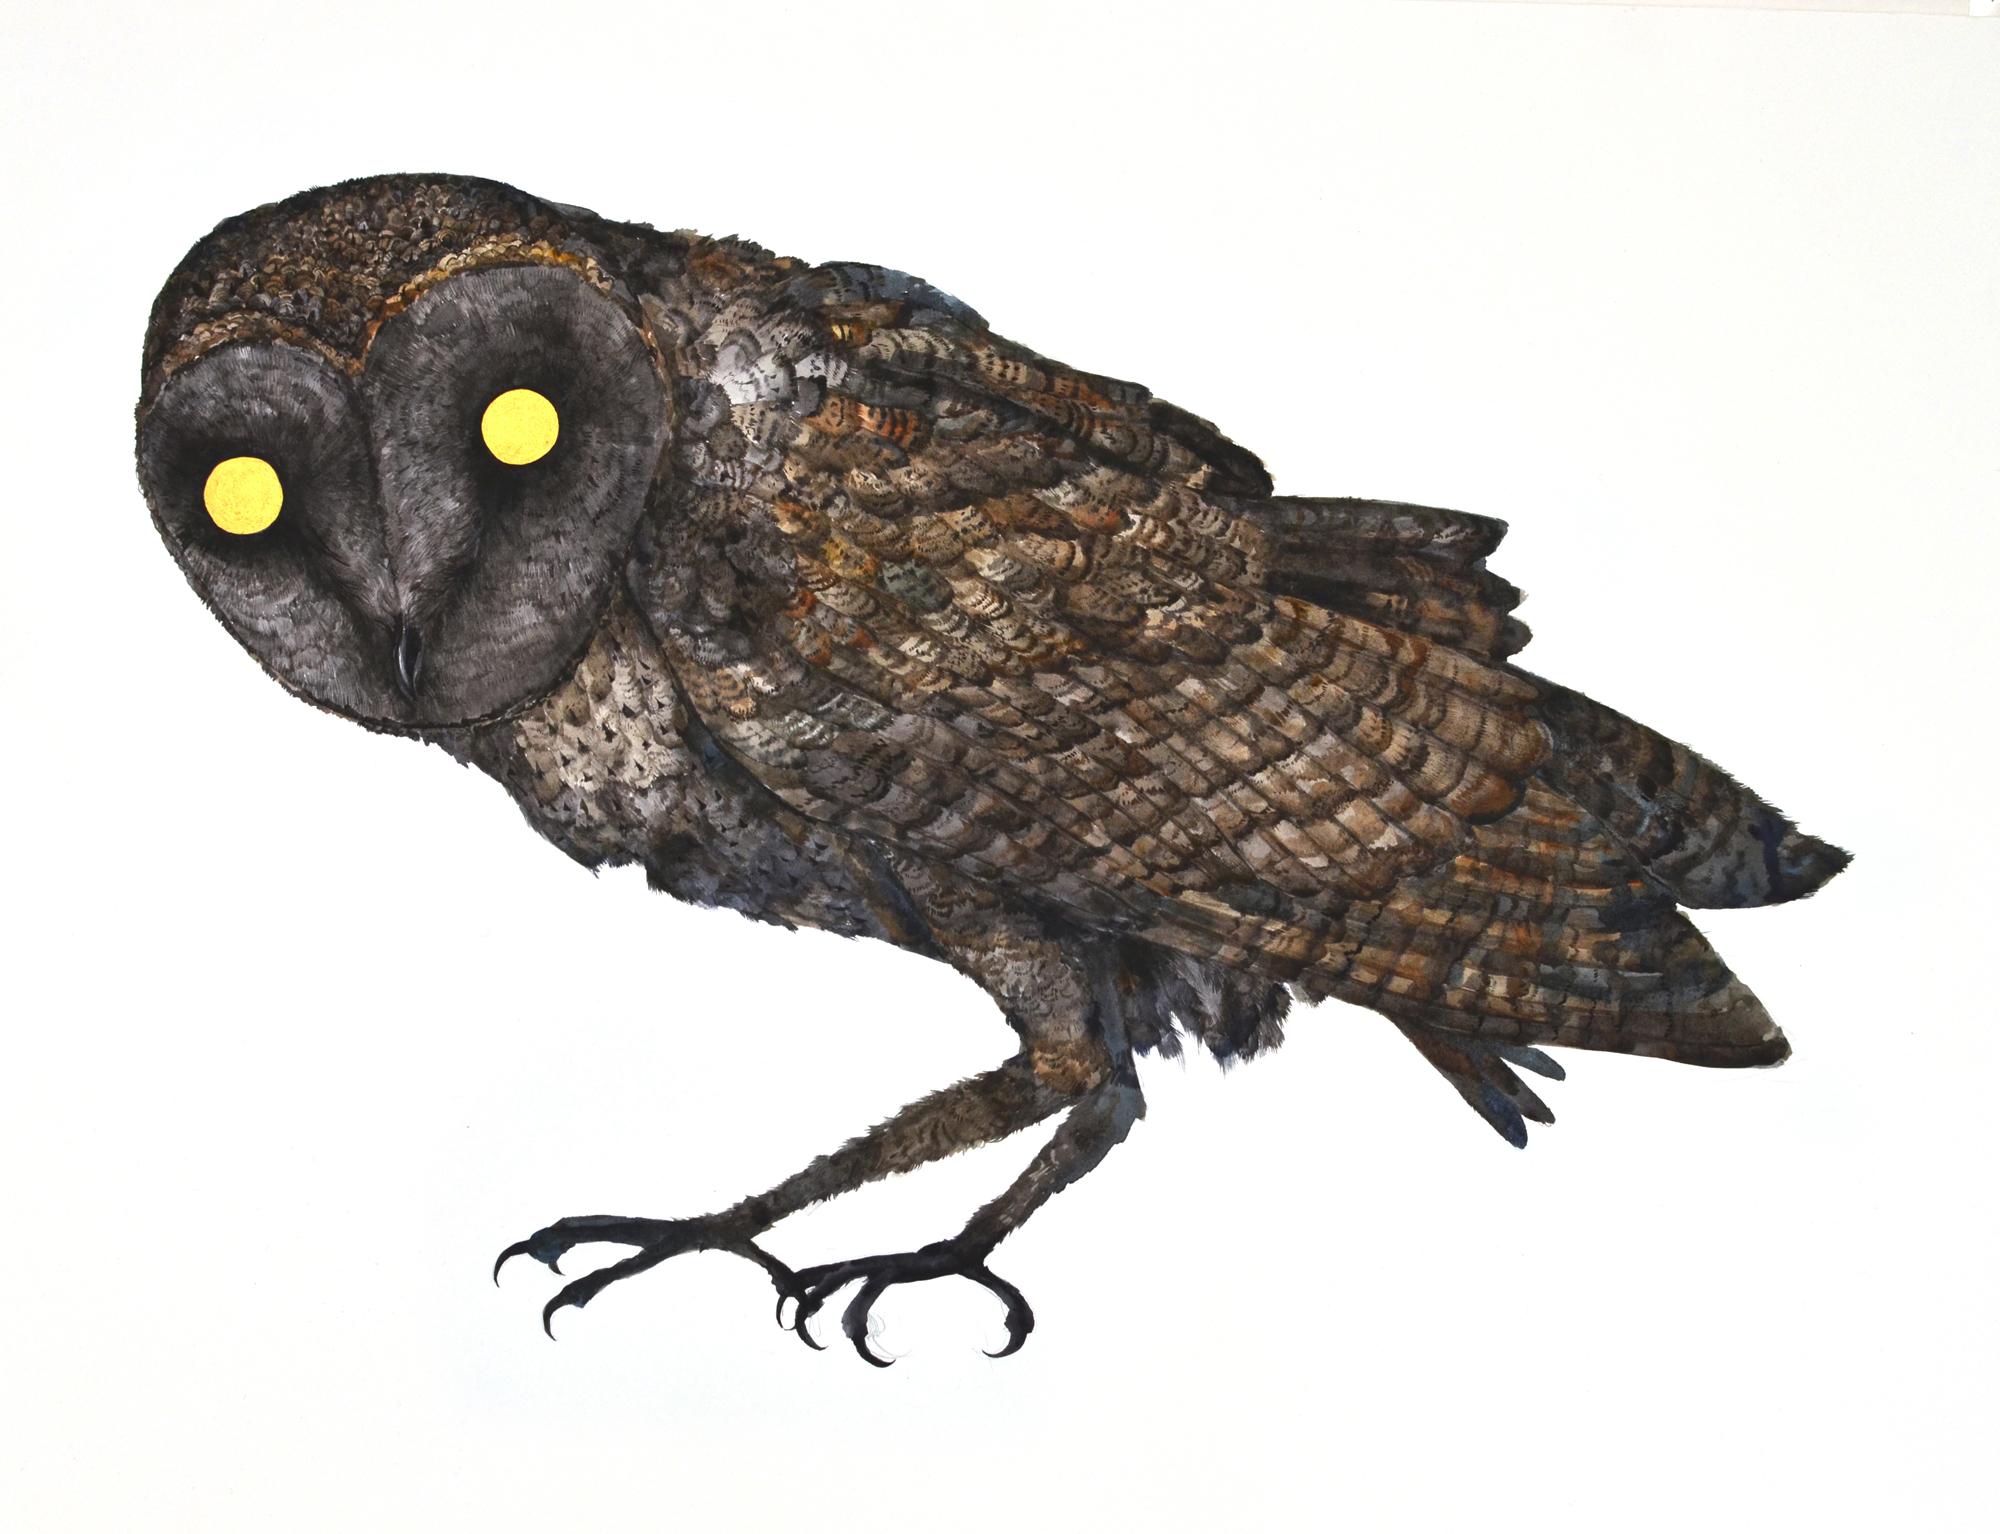 Simon MacEwan, Watcher I , 2012, watercolour on paper, 56 x 76cm